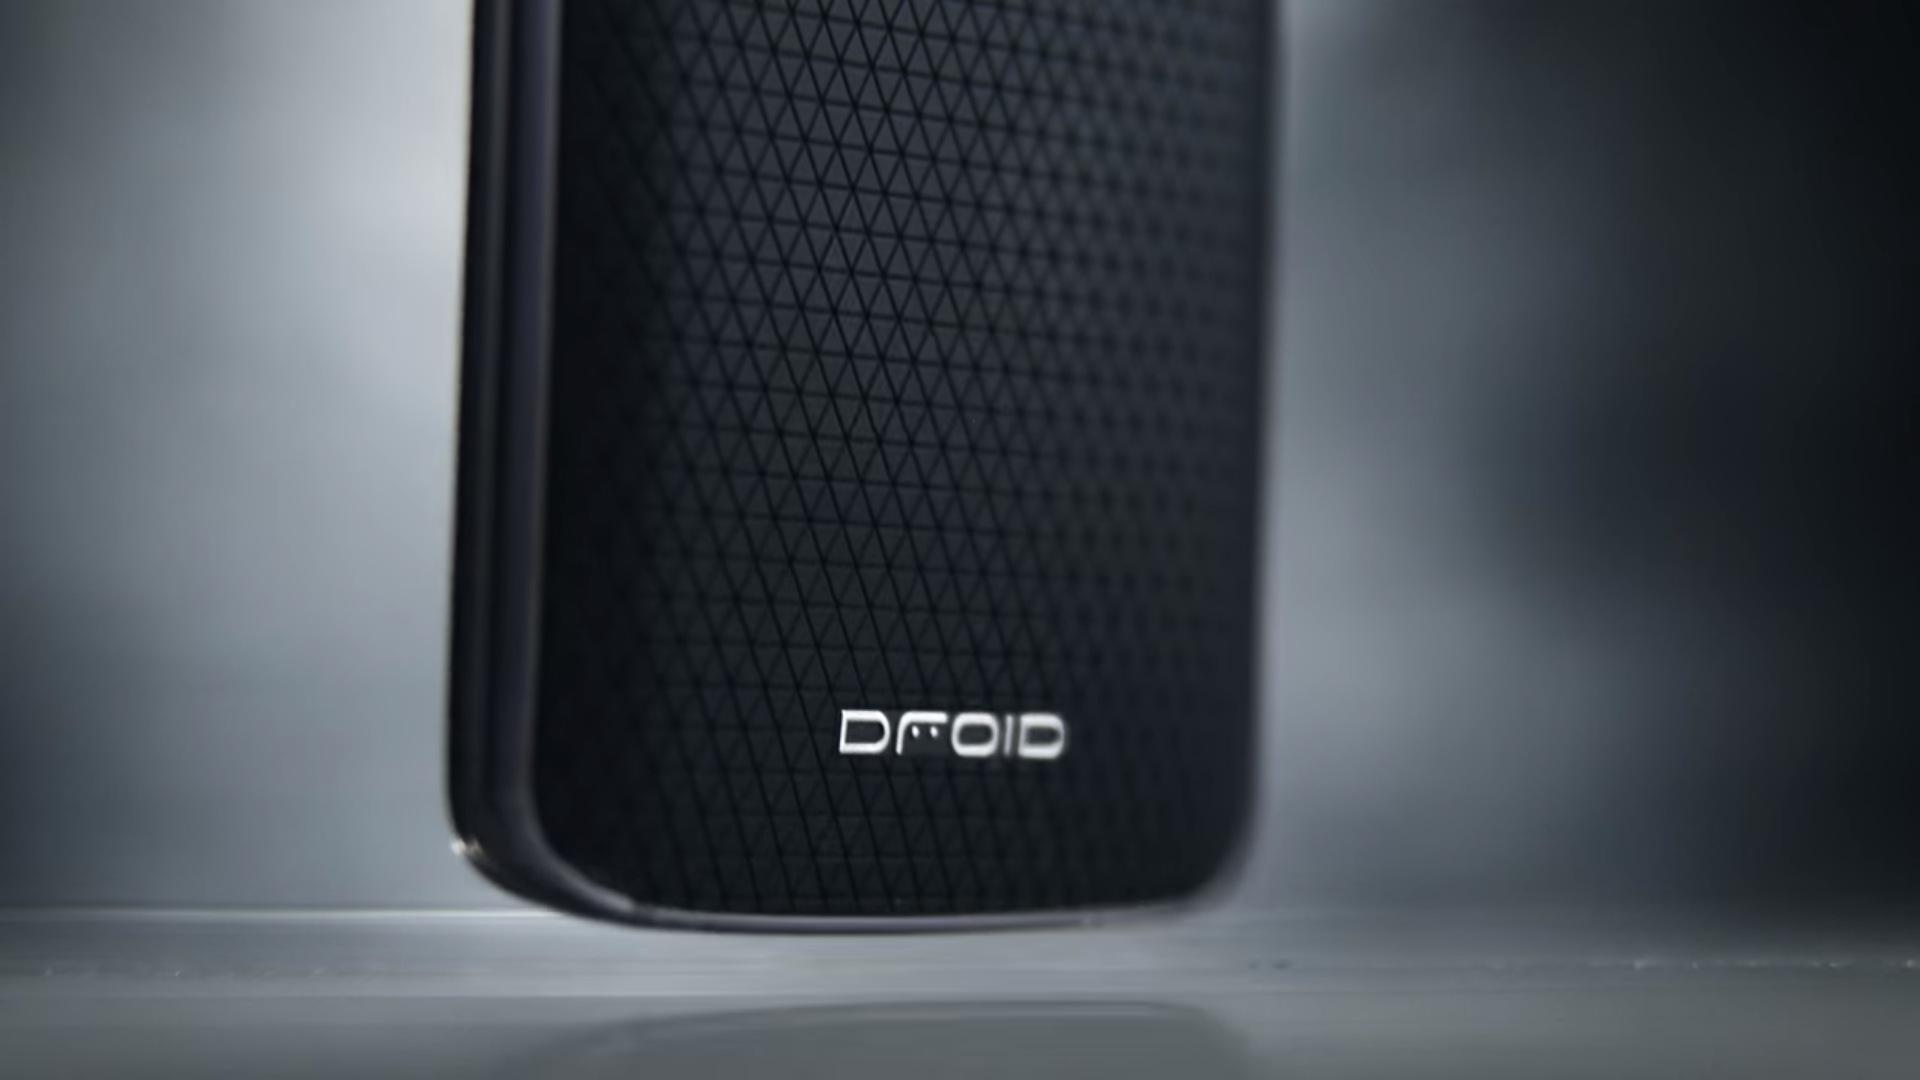 Motorola Doird Turbo 2 (8)